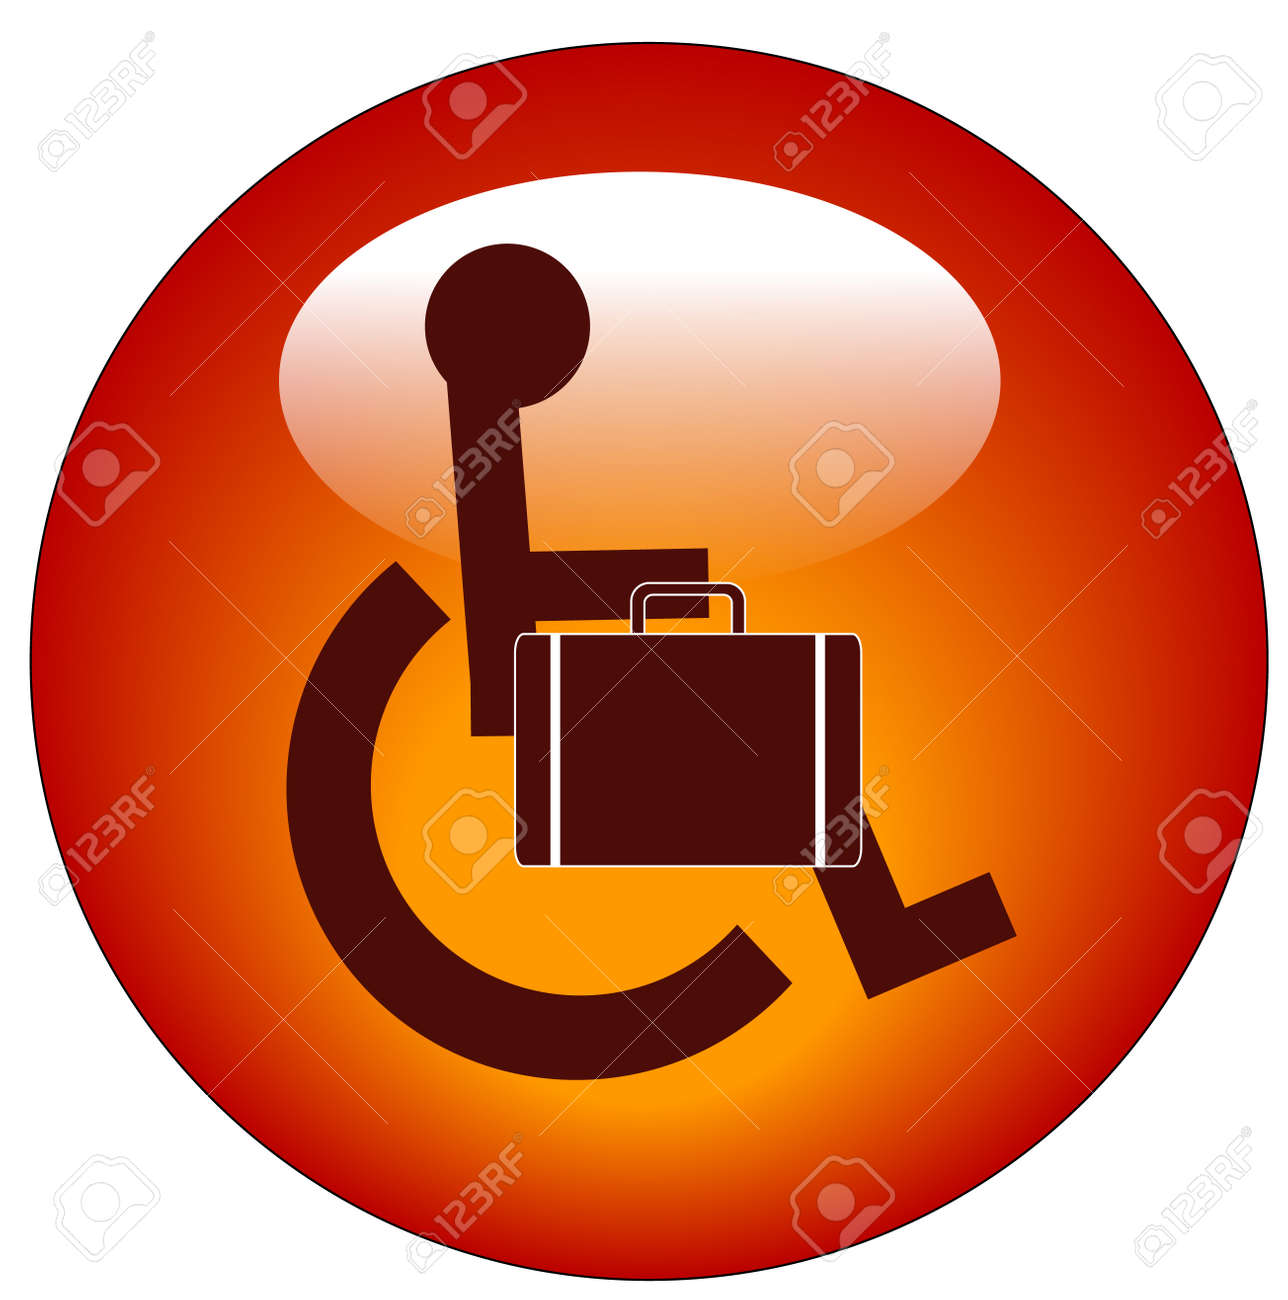 web button for handicap person in wheelchair carrying briefcase Stock Vector - 3263147